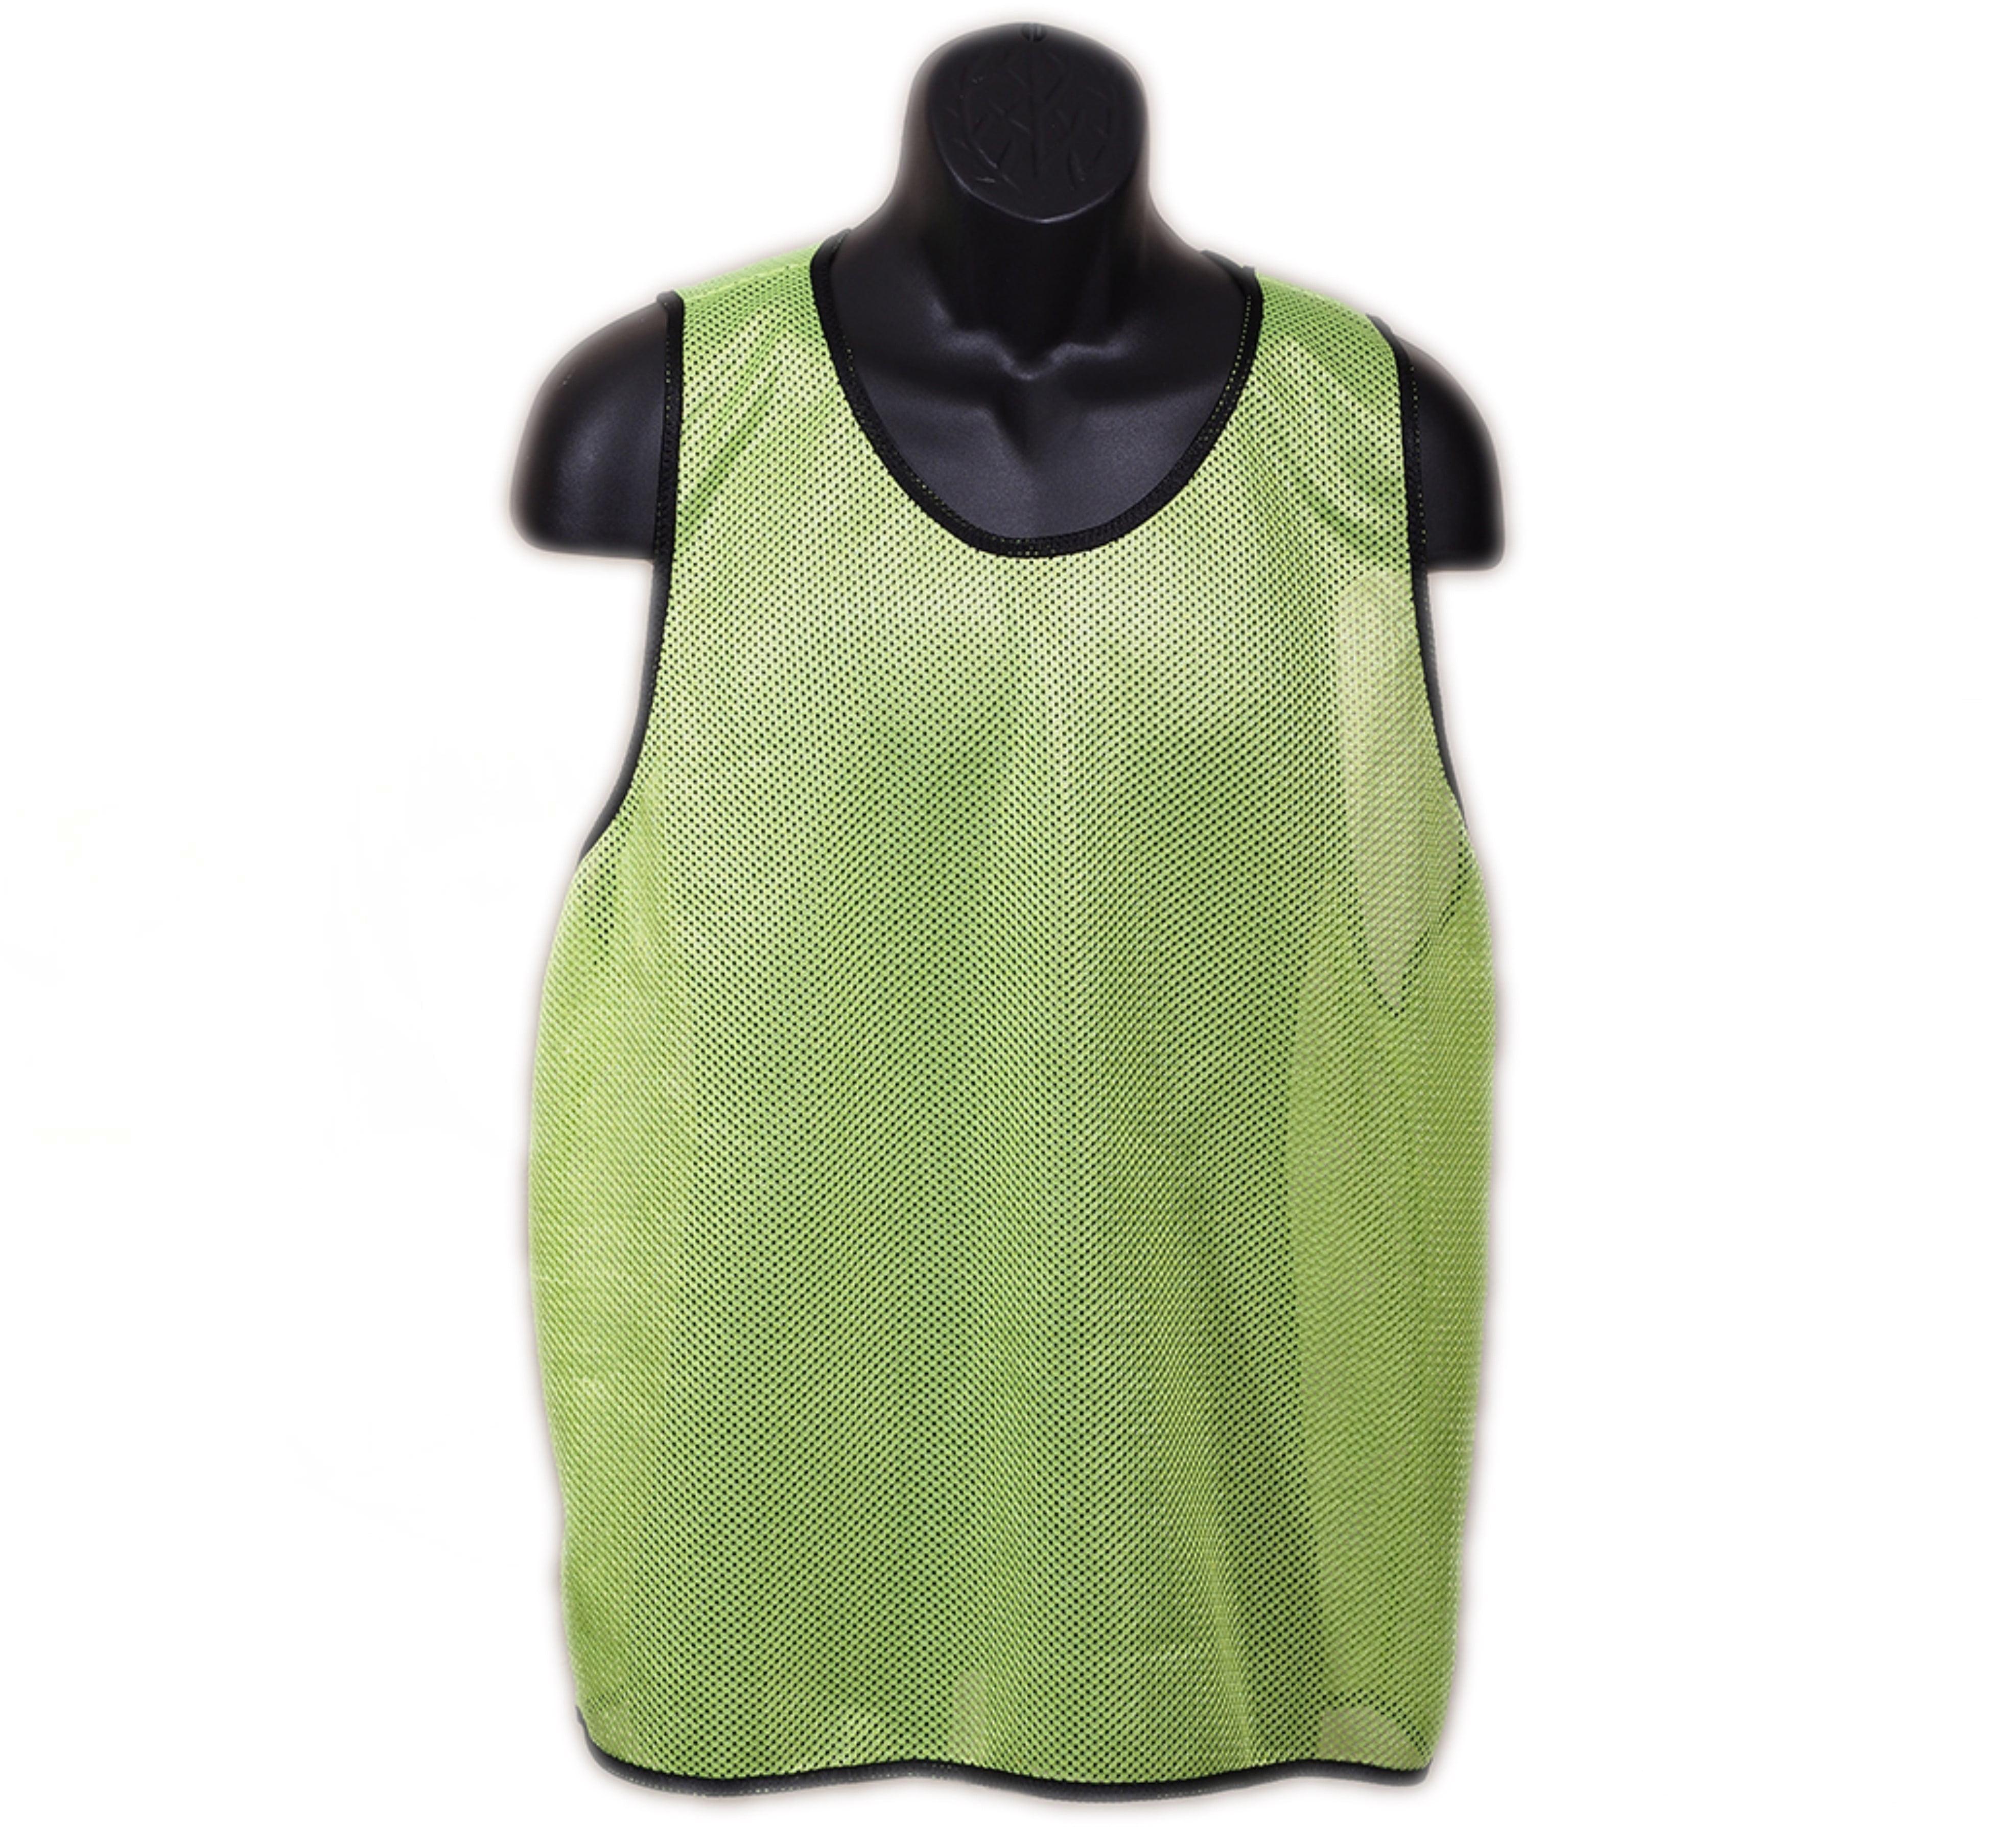 53bdf7851 6 Scrimmage Pinnies Vests Mesh Soccer Practice - Walmart.com